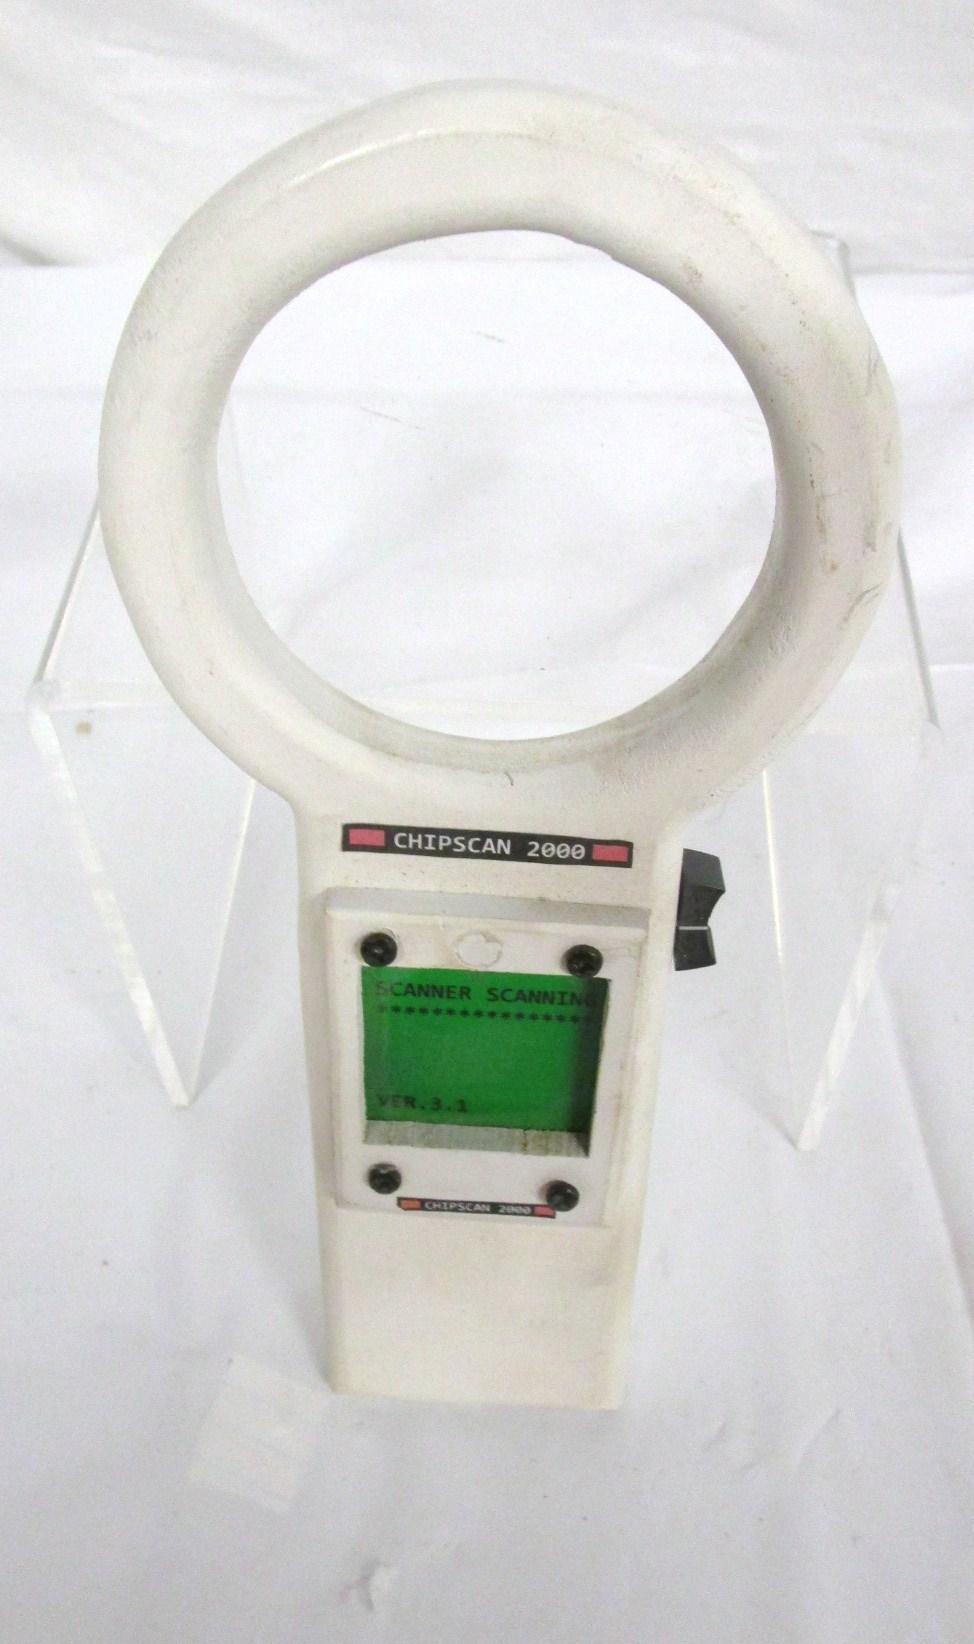 Chipscan detector